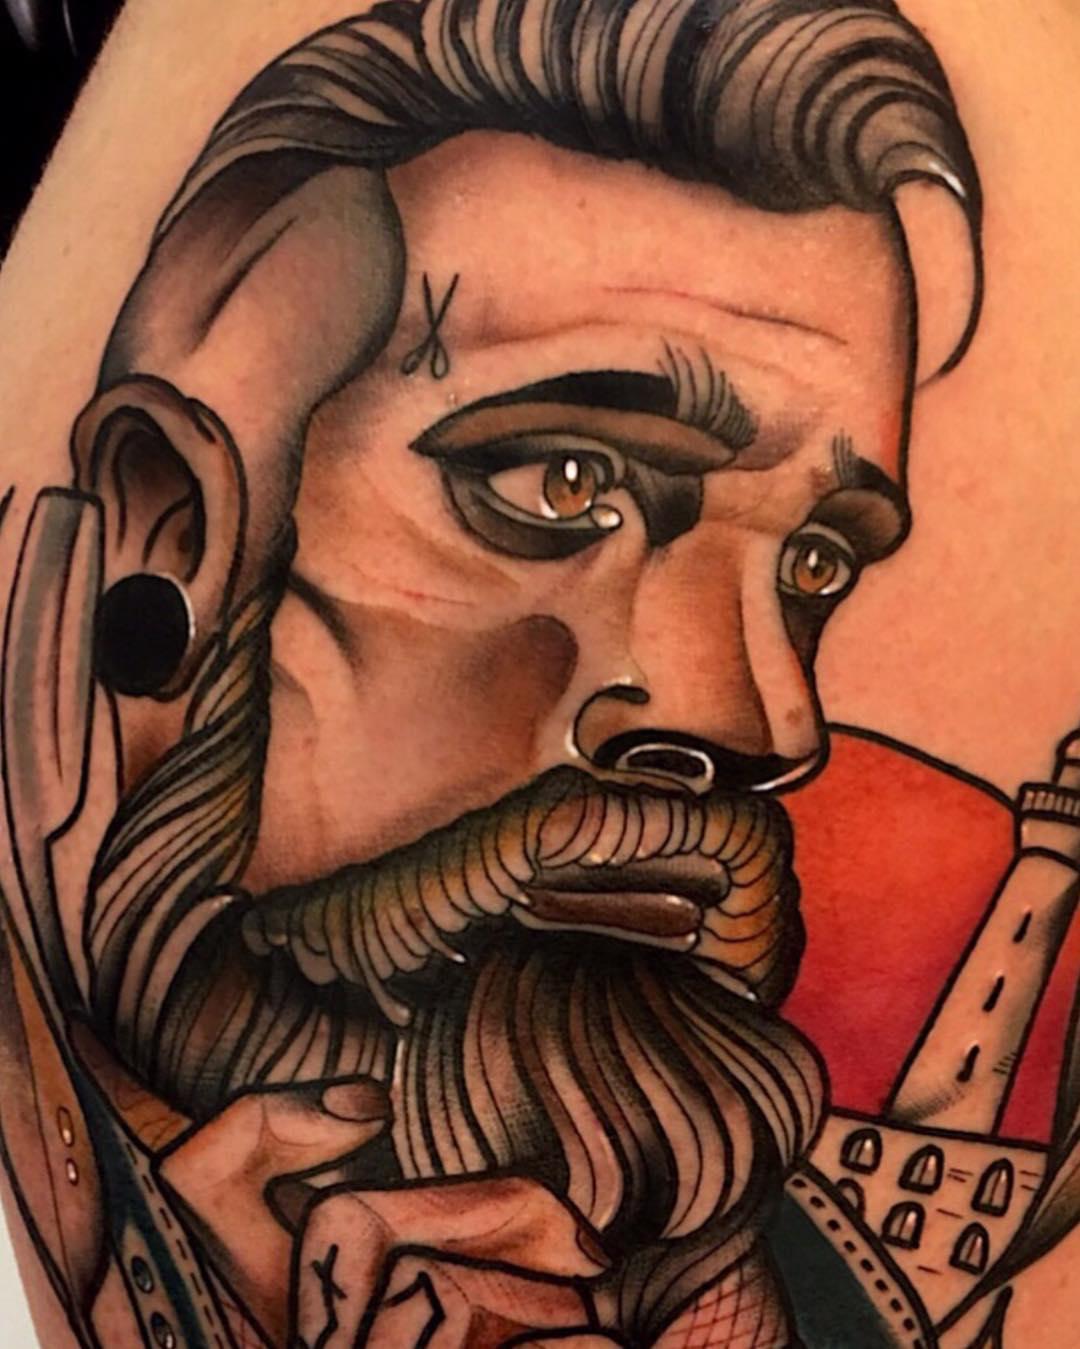 details,followforfollow,followme,follow,ciudadreal,tattoos,theblackandgreytattooleague,ciudadrealtattoo,tattooshop,tattooers,besttattooers,juantabasco,ciudadrealsetatua,ink,inkmaster,tatuajes,realismo,realistictattoo,ciudadrealtattoo,americanatattoos,traditionaltattoos,music,eeuu,inked,inkedlife,inkedsociety,art,amazingink,tattooart,oldlines